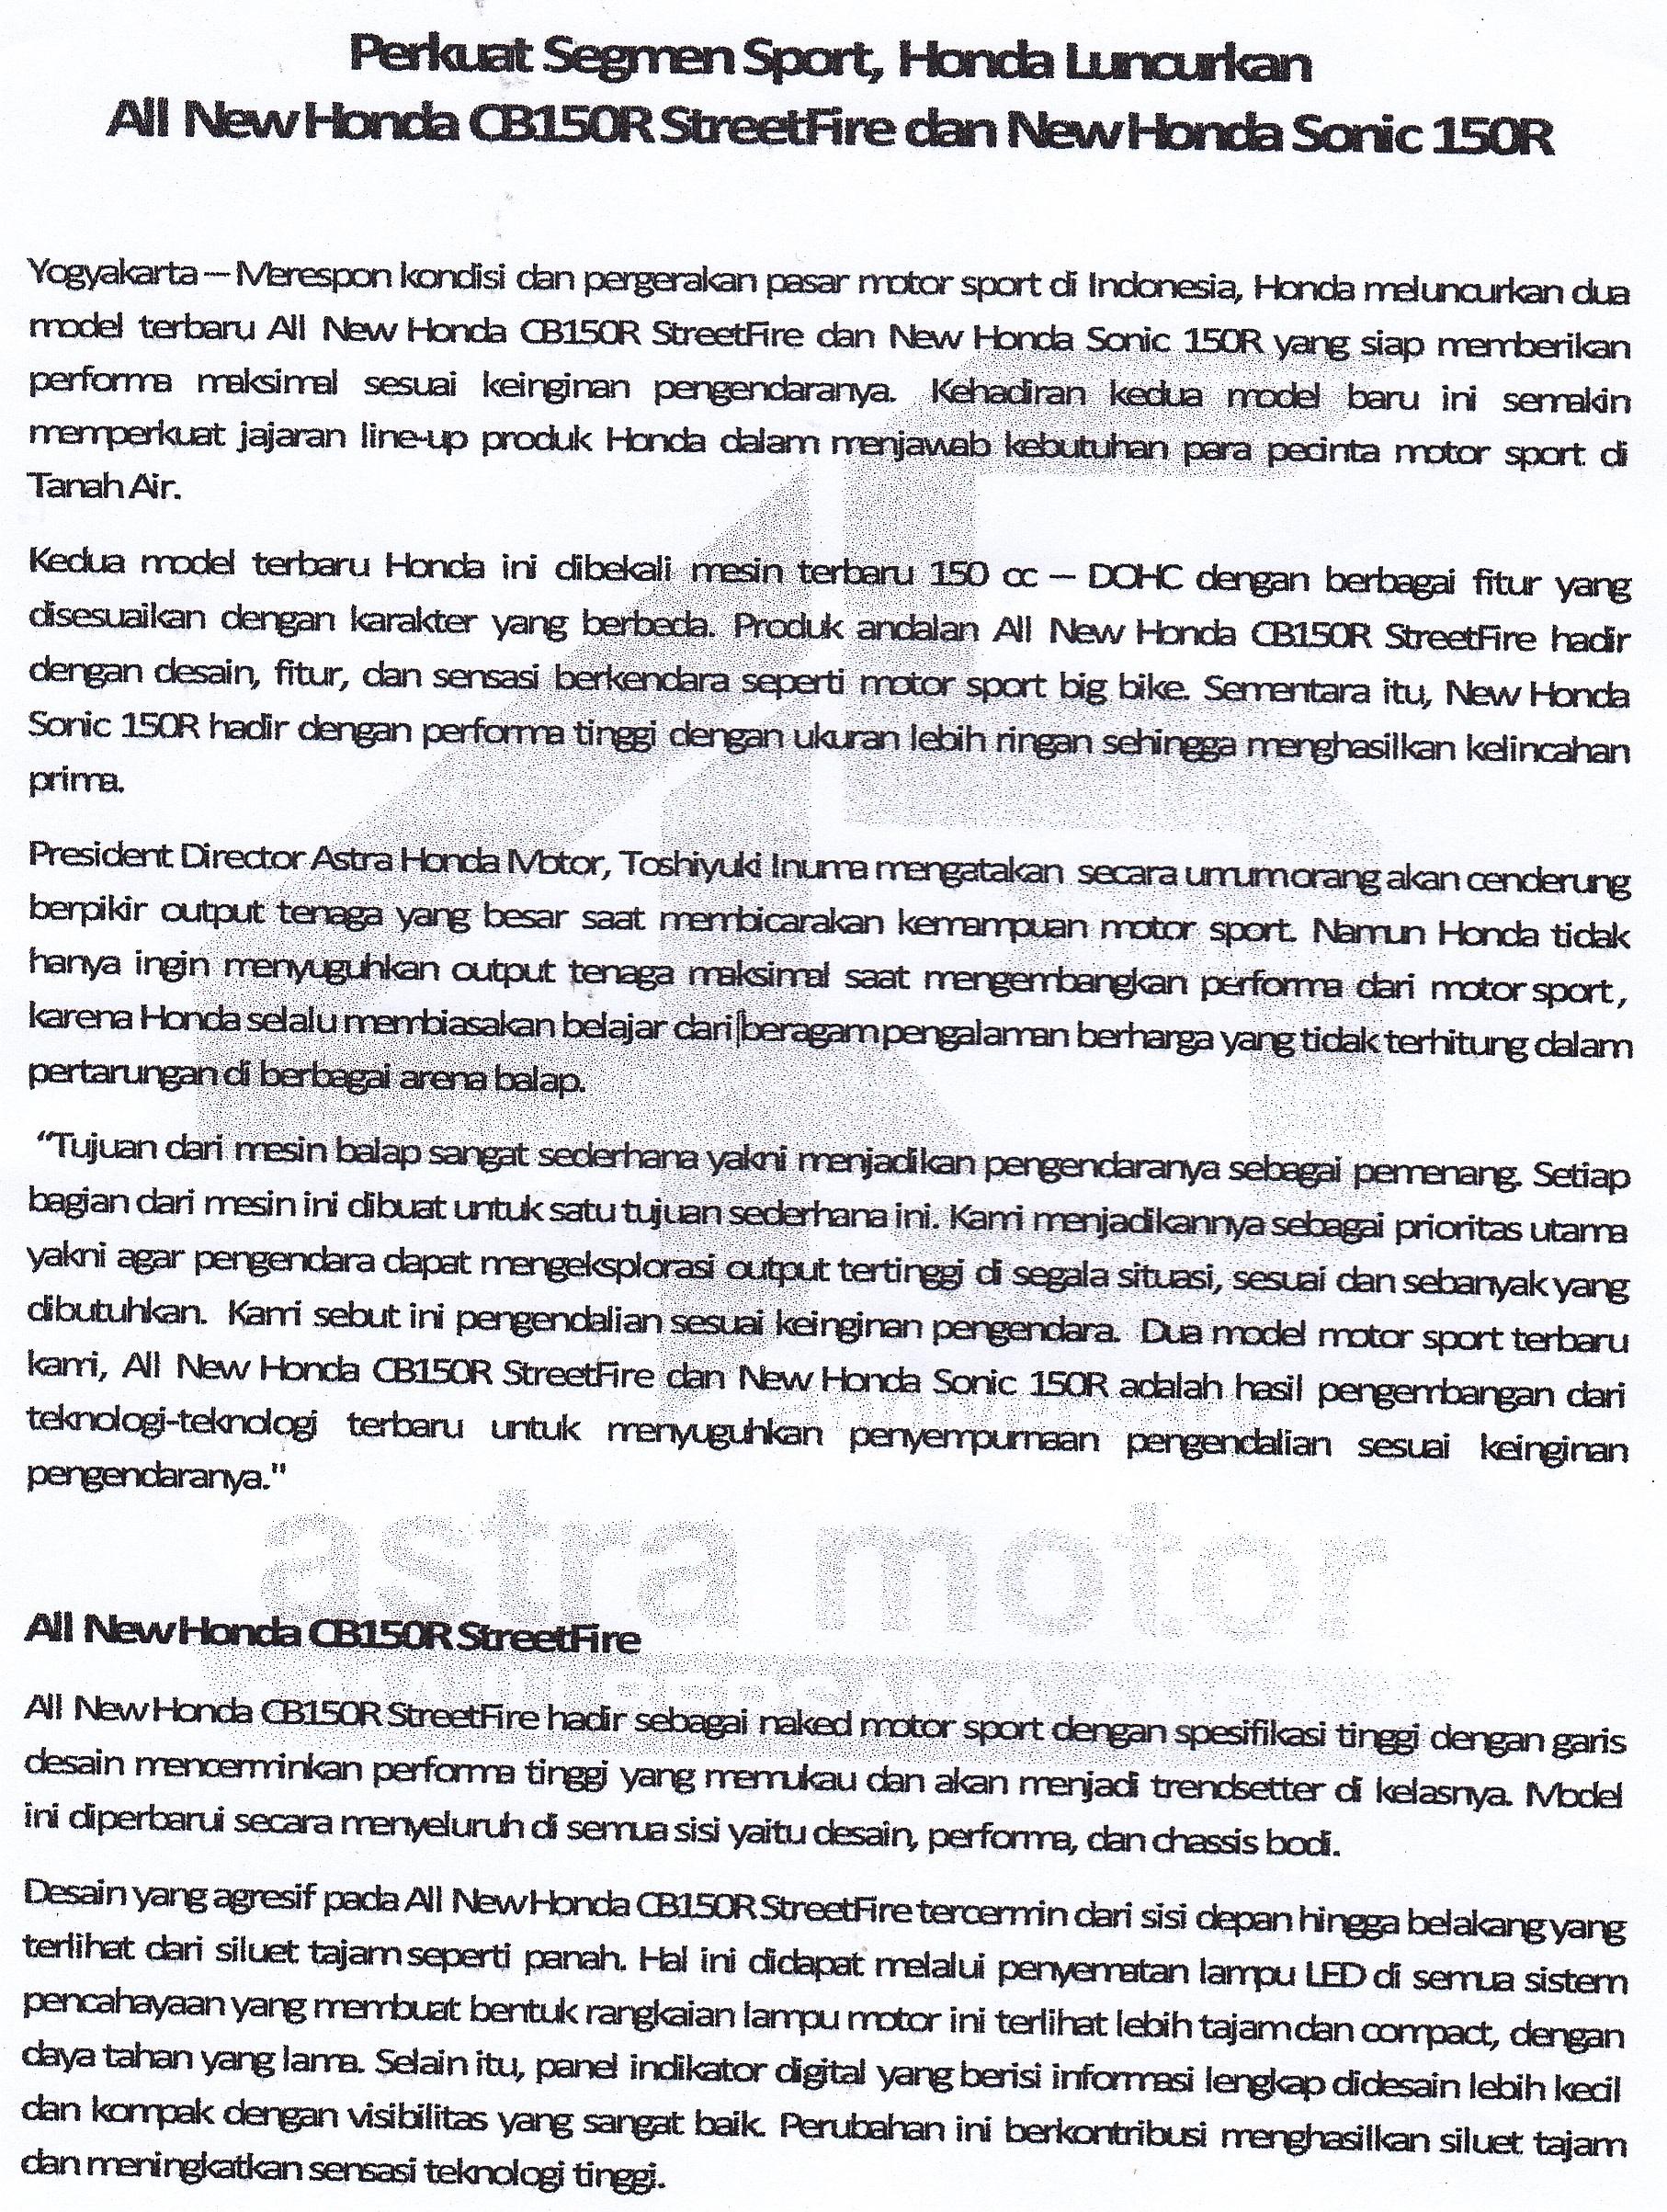 Sepeda Motor Page 113 New Vario 110 Esp Cbs Iss Grande White Yogyakarta Pr1ok